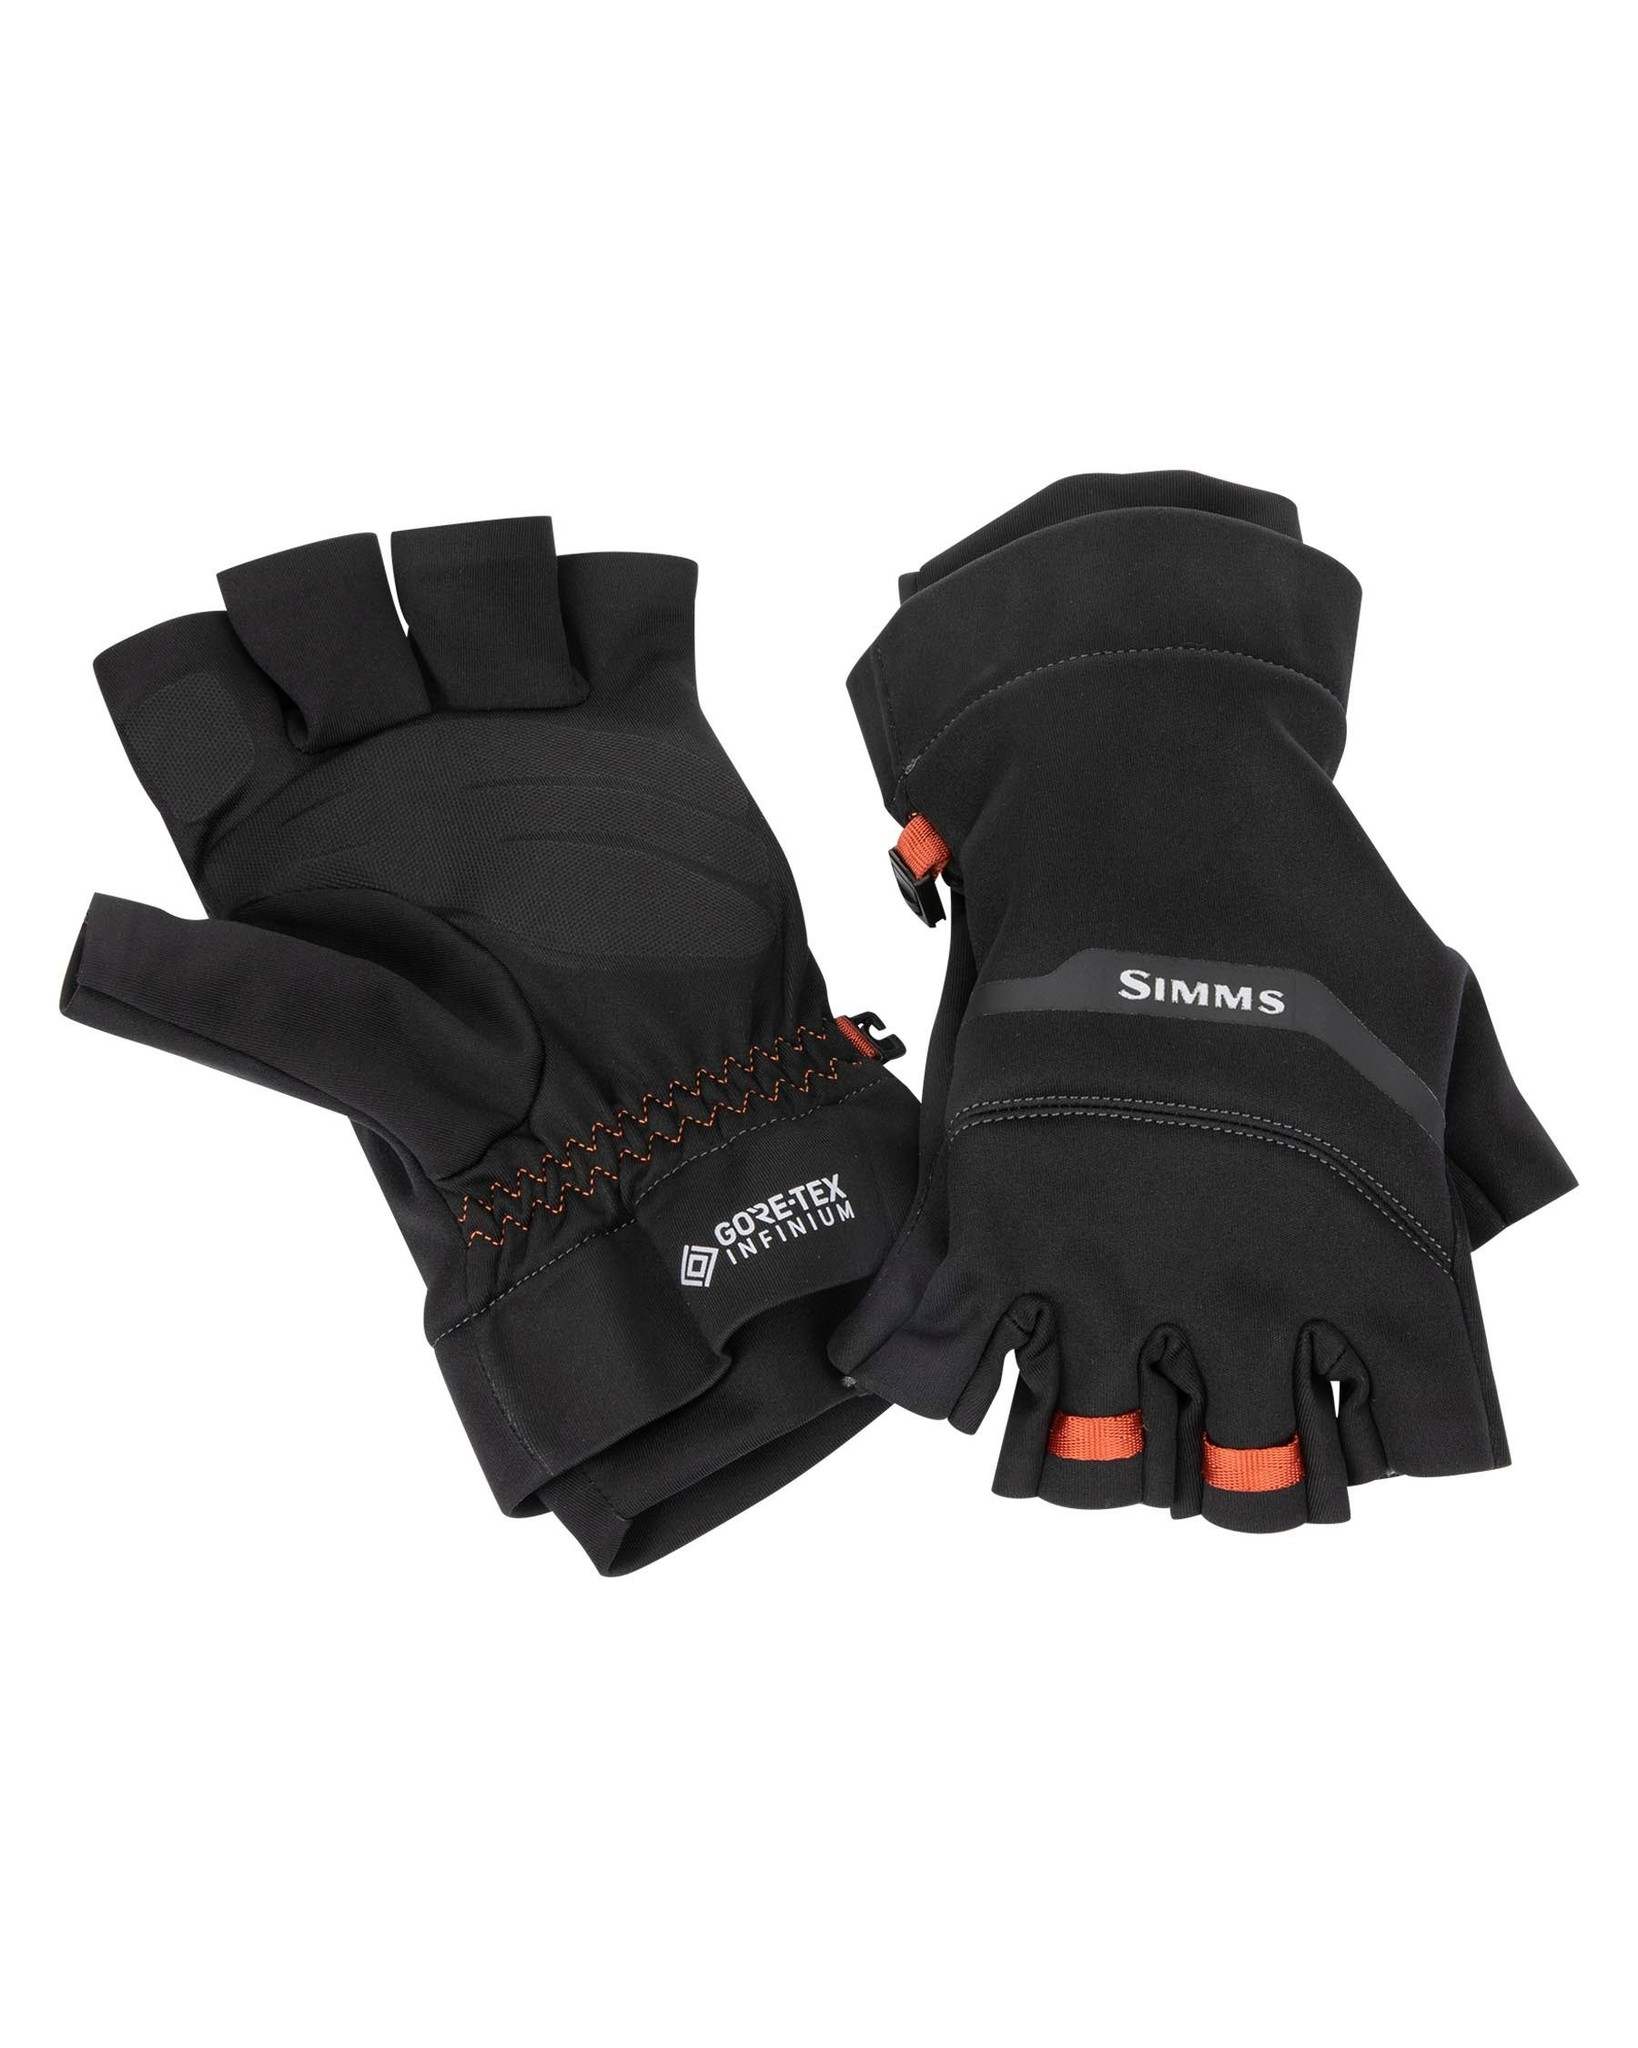 SIMMS Gore Infinium 1/2 Finger Glove